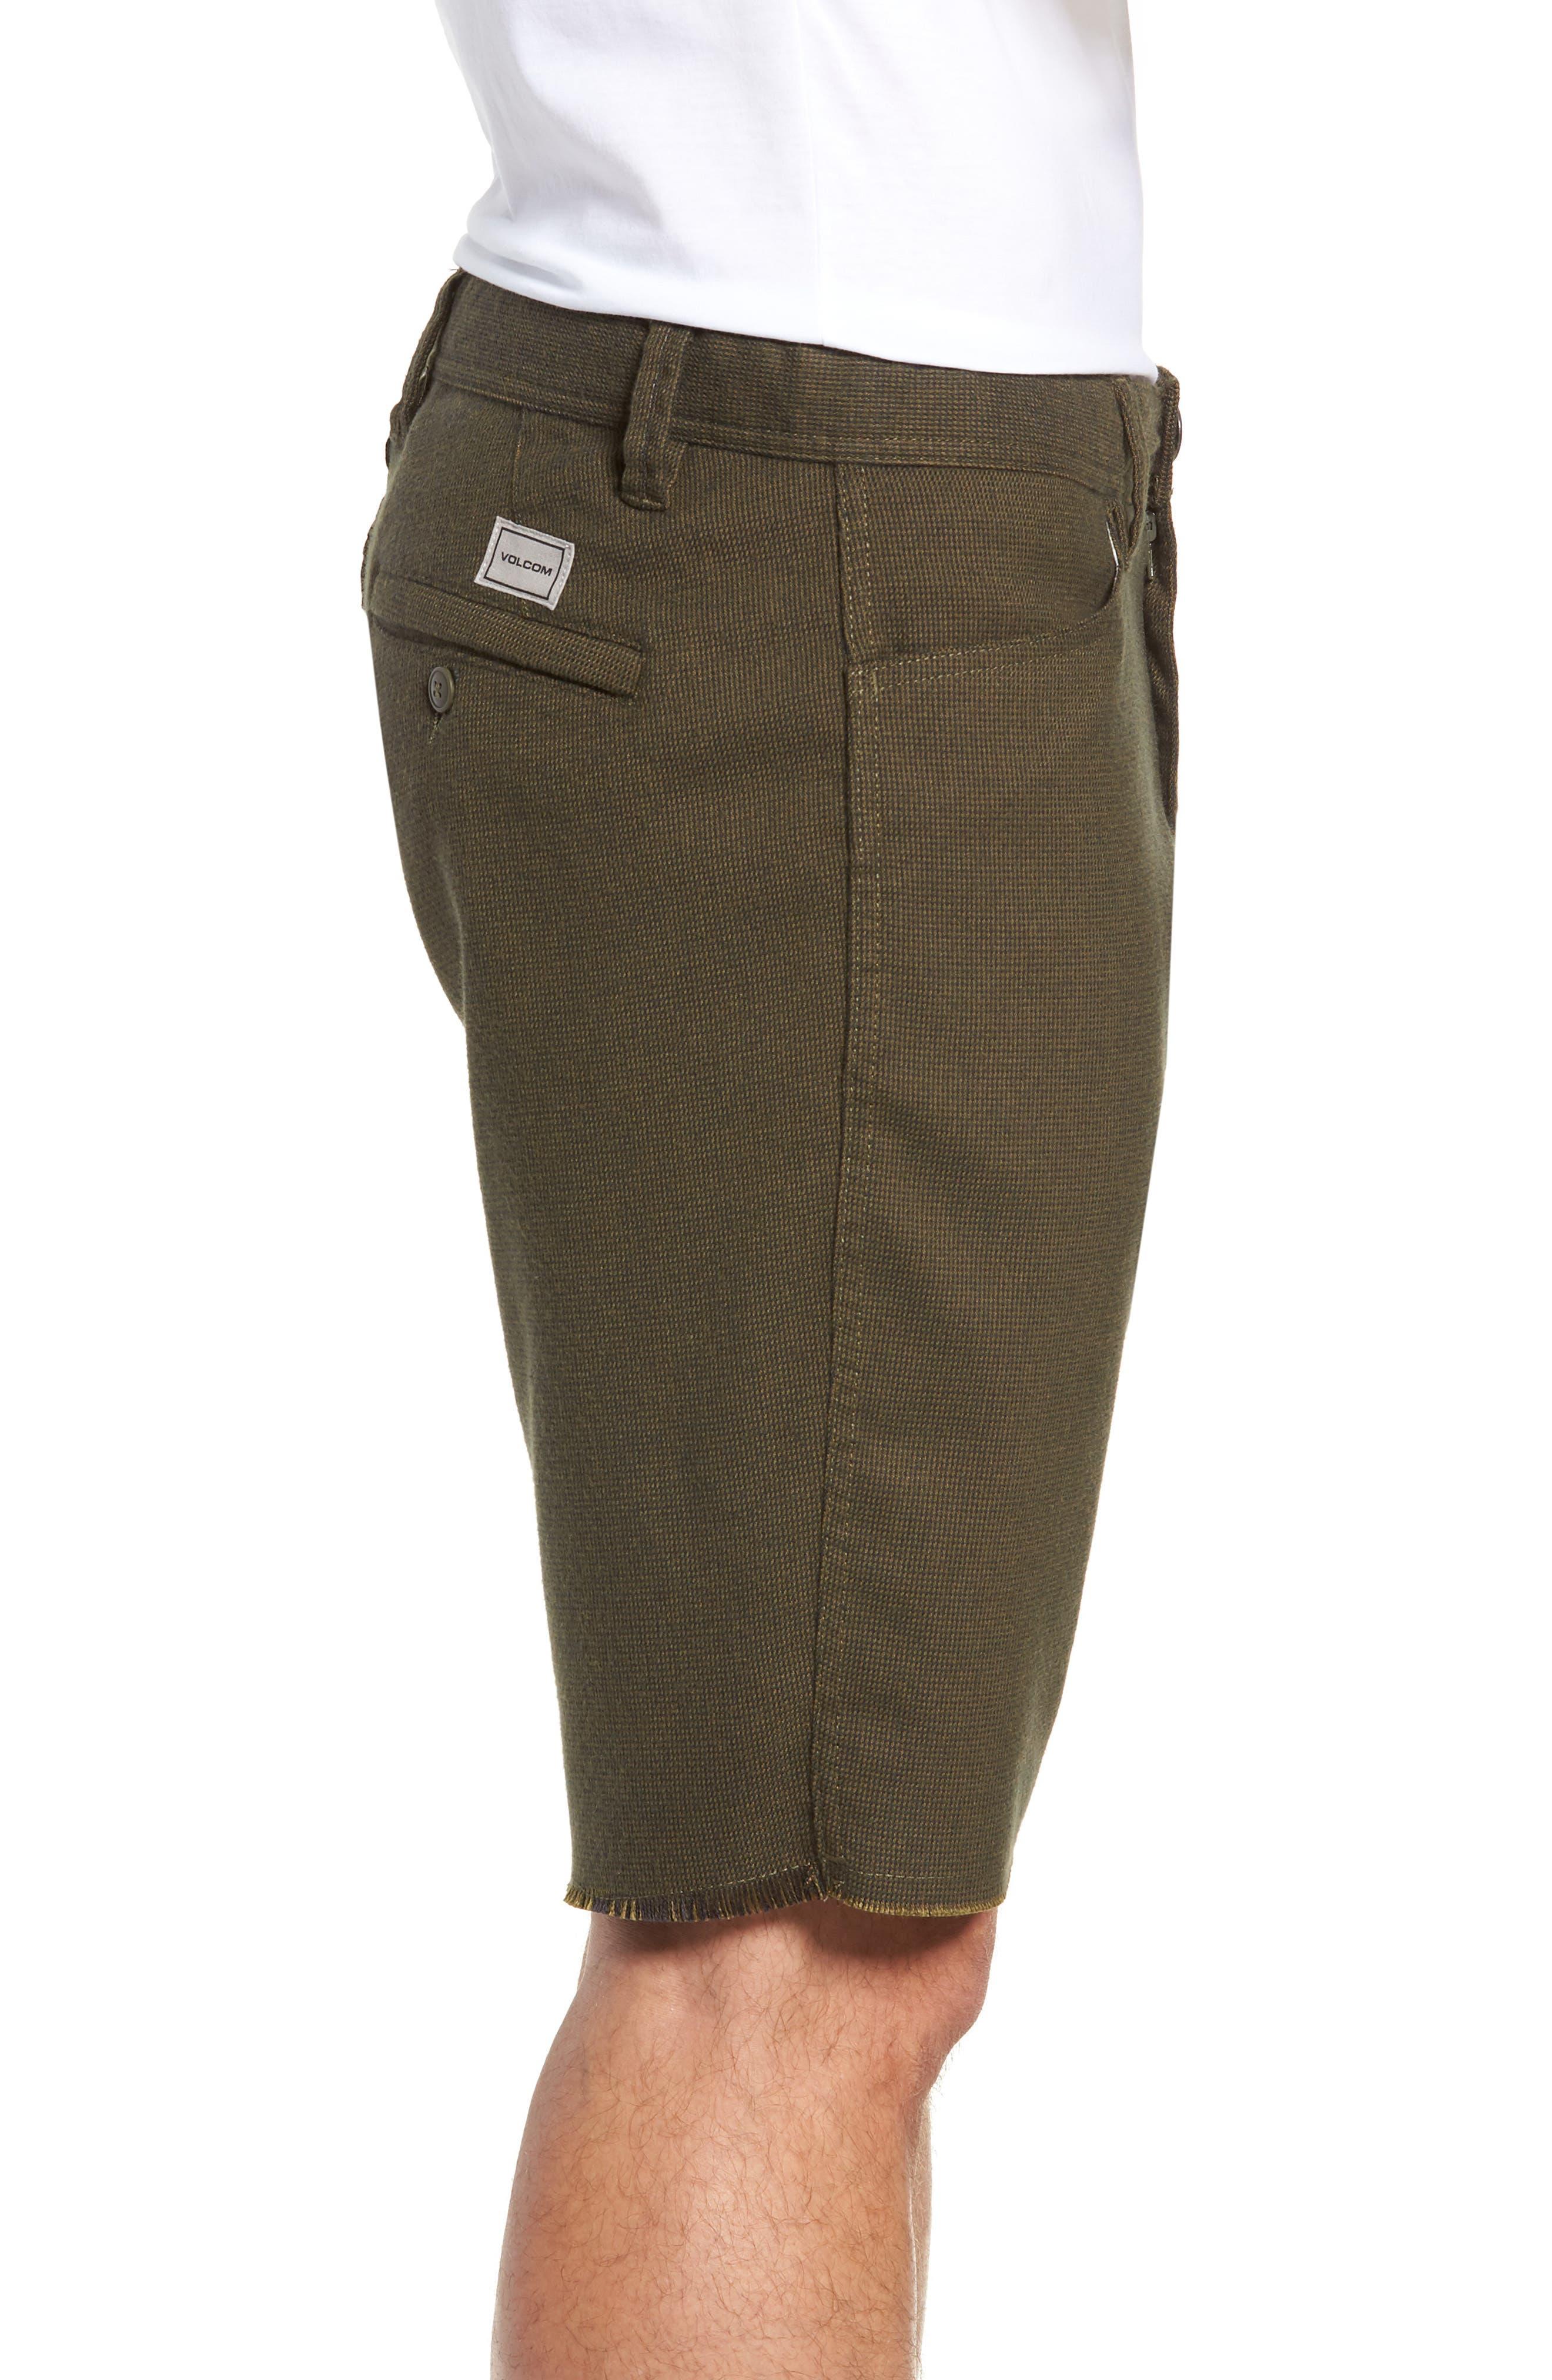 Gritter Thrifter Shorts,                             Alternate thumbnail 3, color,                             GREENTEA